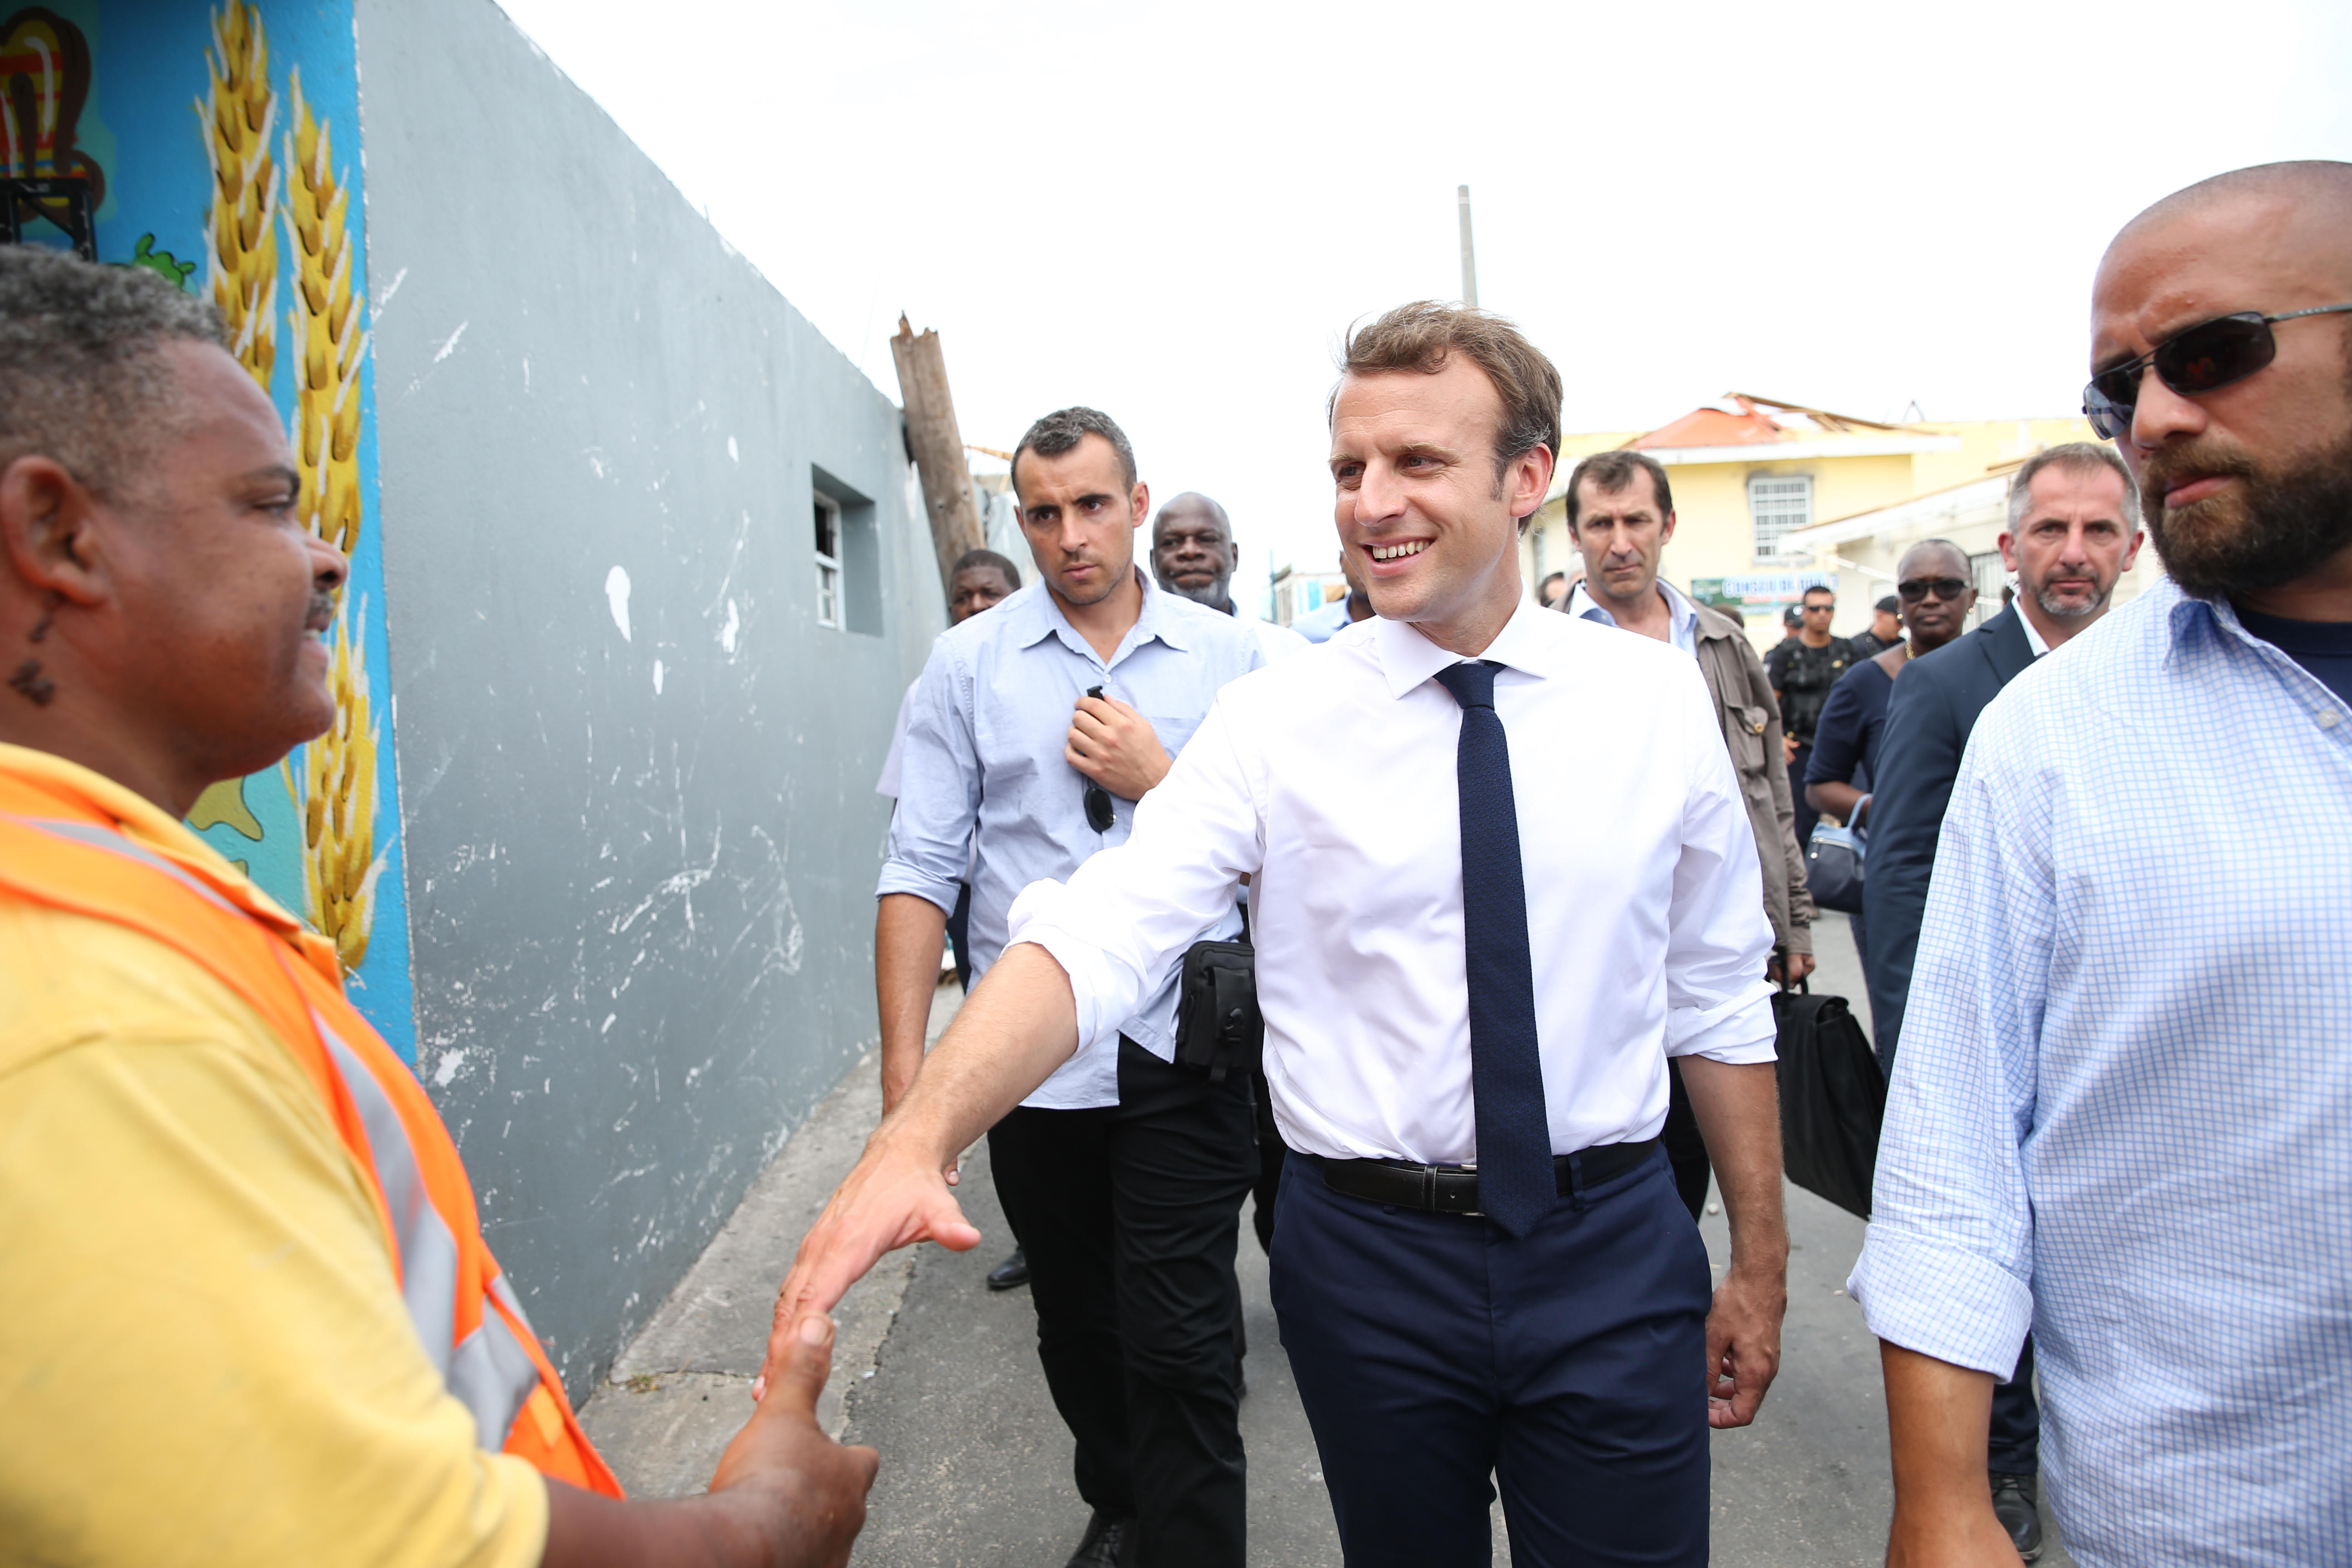 French Presidente Emmanuel Macron Visits Saint Martin After Hurrican Irma